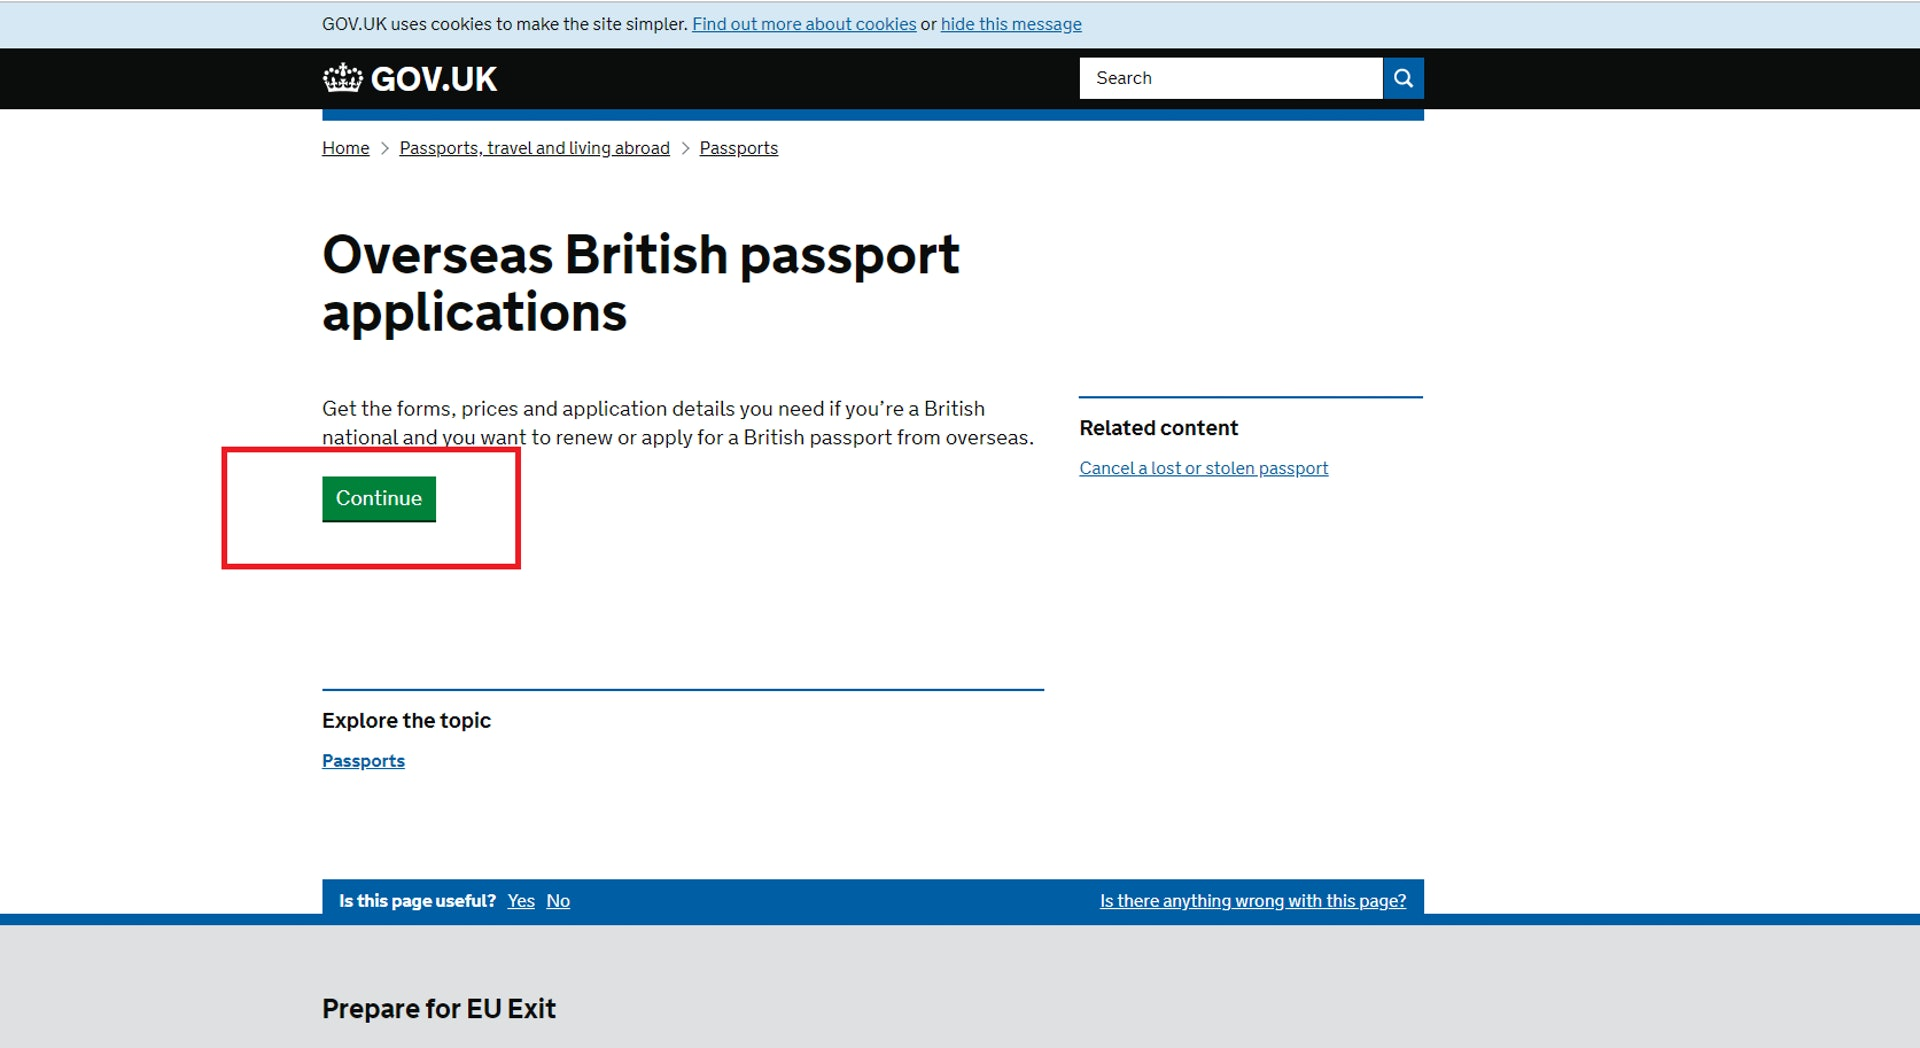 按下 「Continue」開始申請(GOV.UK 網站截圖)